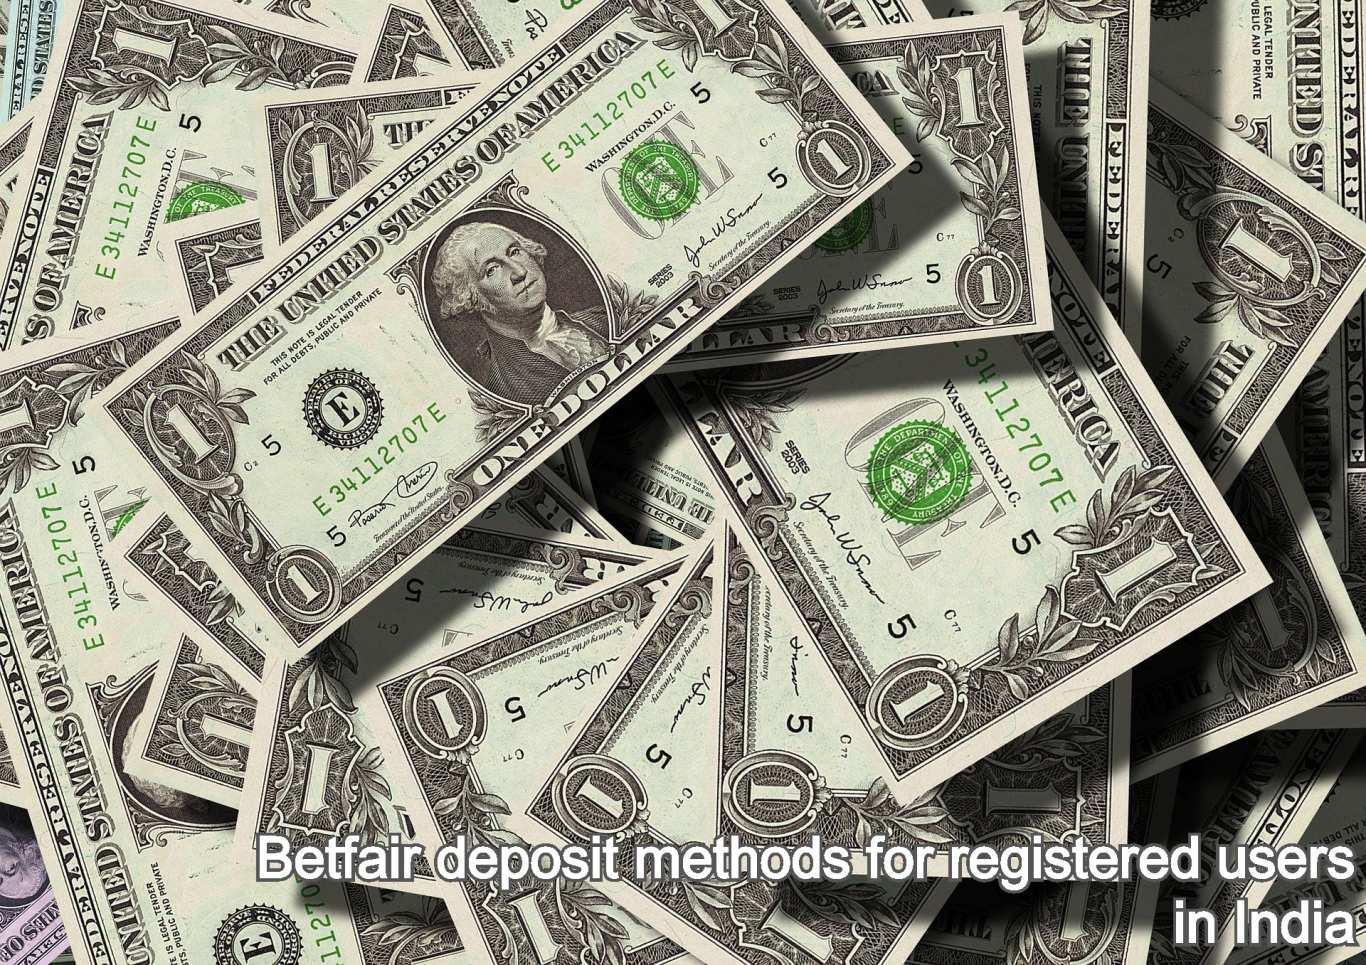 Betfair deposit methods for registered users in India